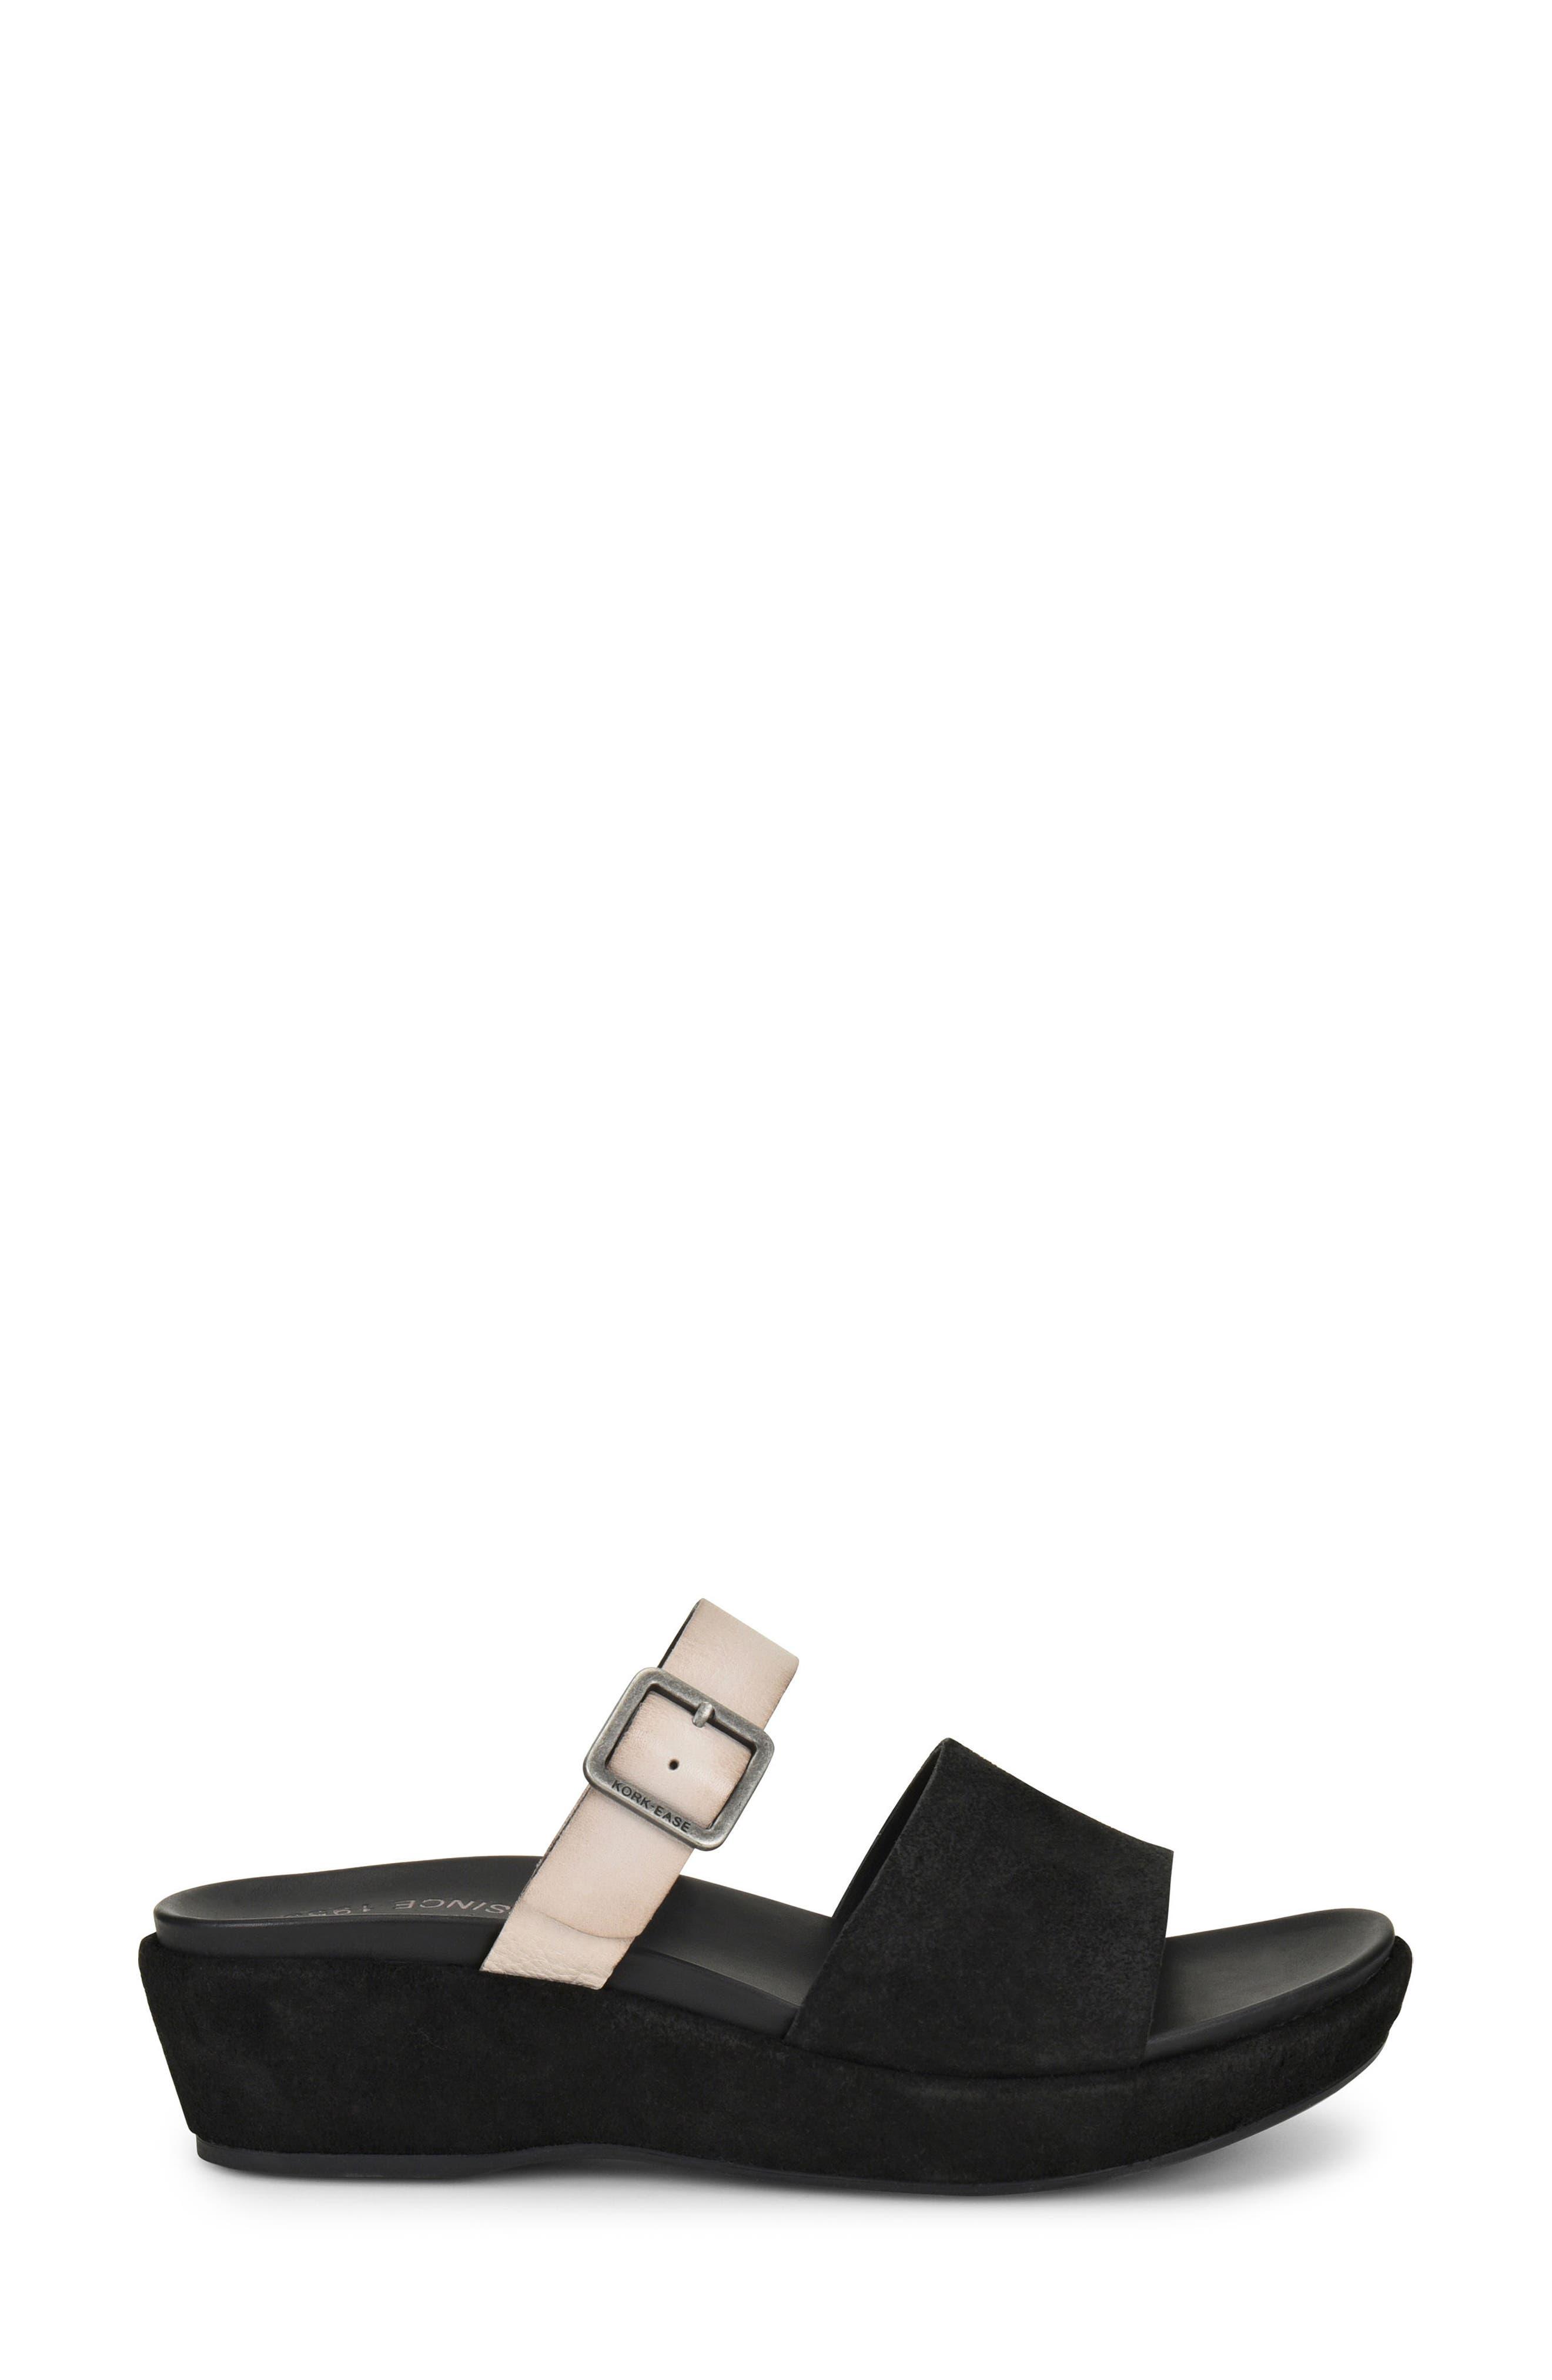 Bisti Wedge Slide Sandal,                             Alternate thumbnail 3, color,                             BLACK/ GREY LEATHER